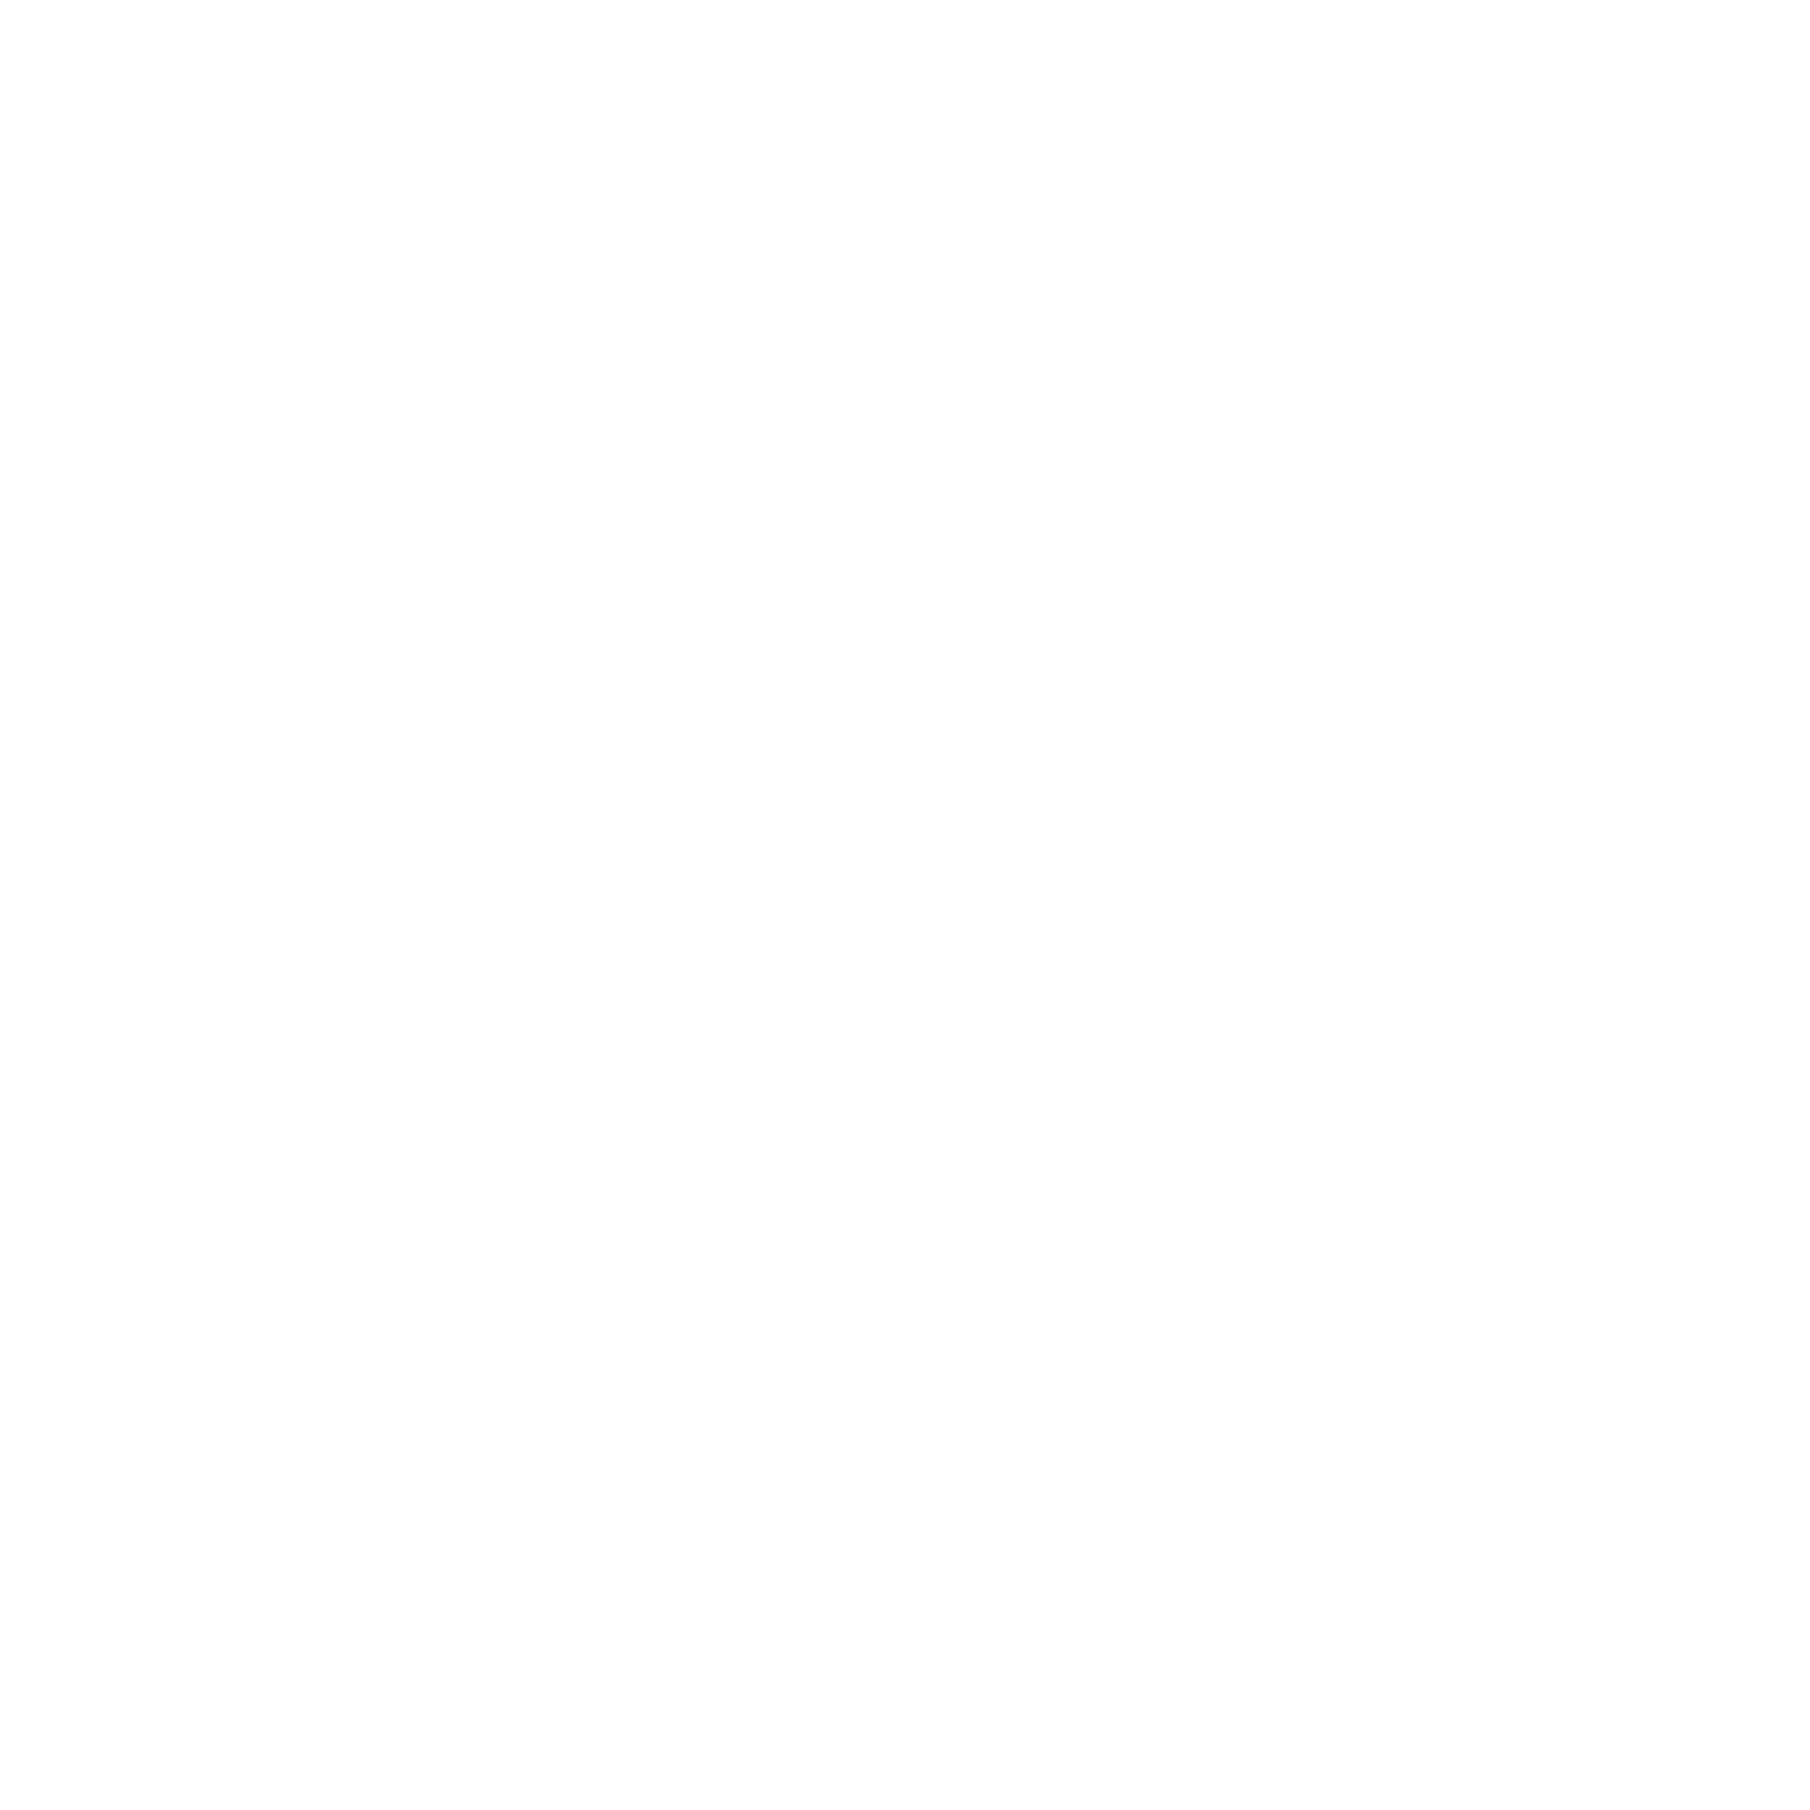 LF Ent